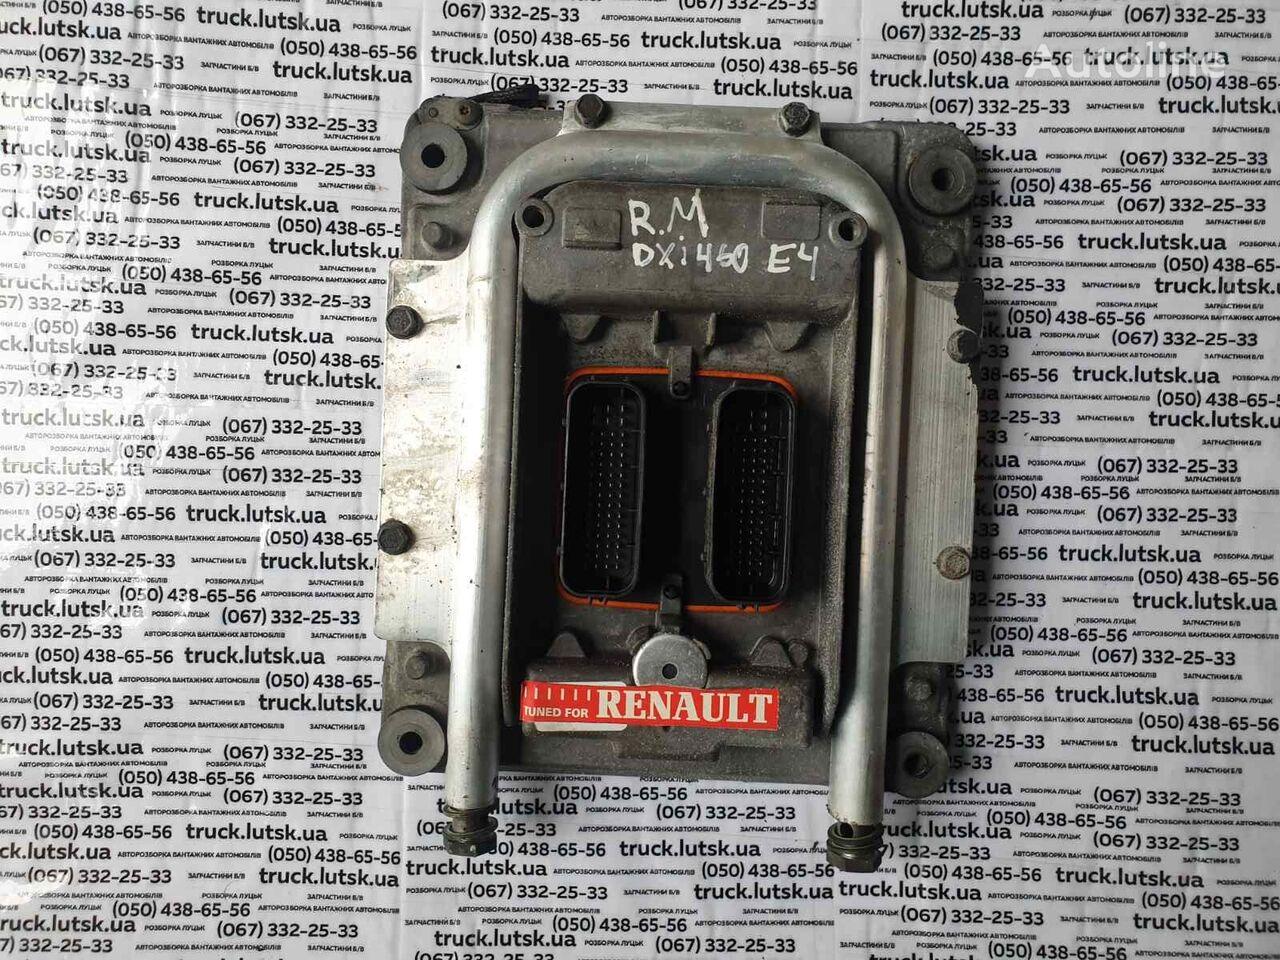 DXI13 (20814604 P03) control unit for RENAULT Magnum tractor unit